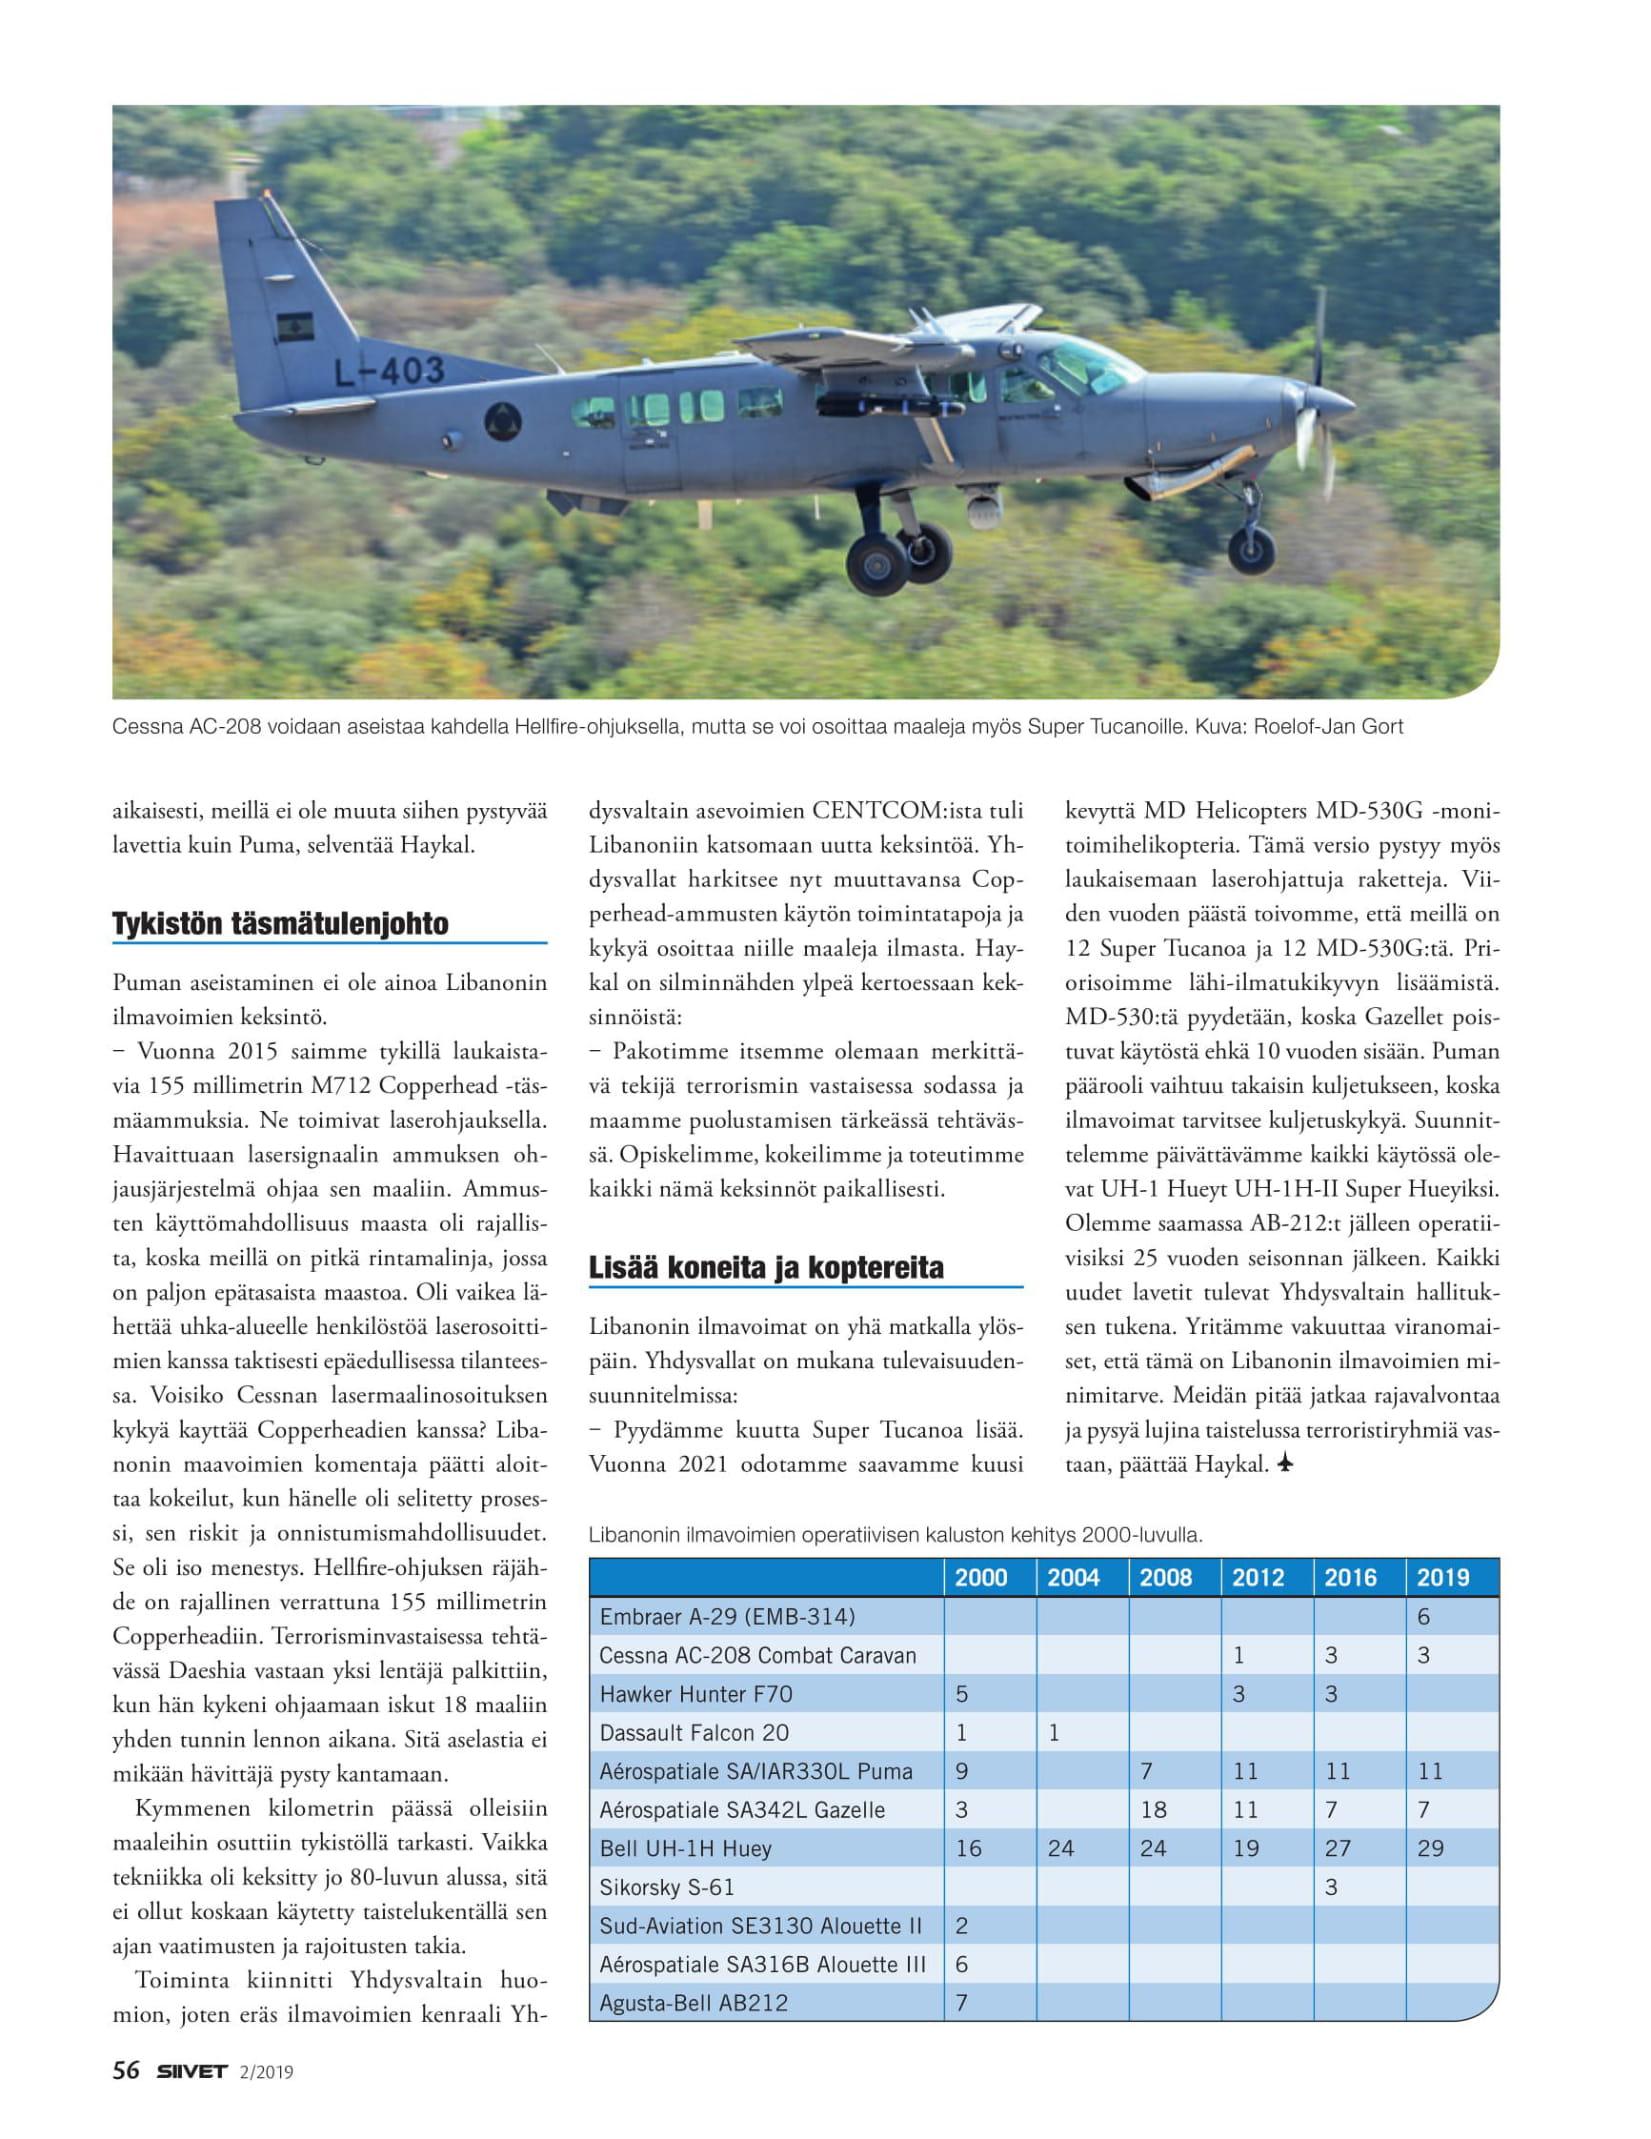 Siivet (Finland)_Lebanese Air Force-6